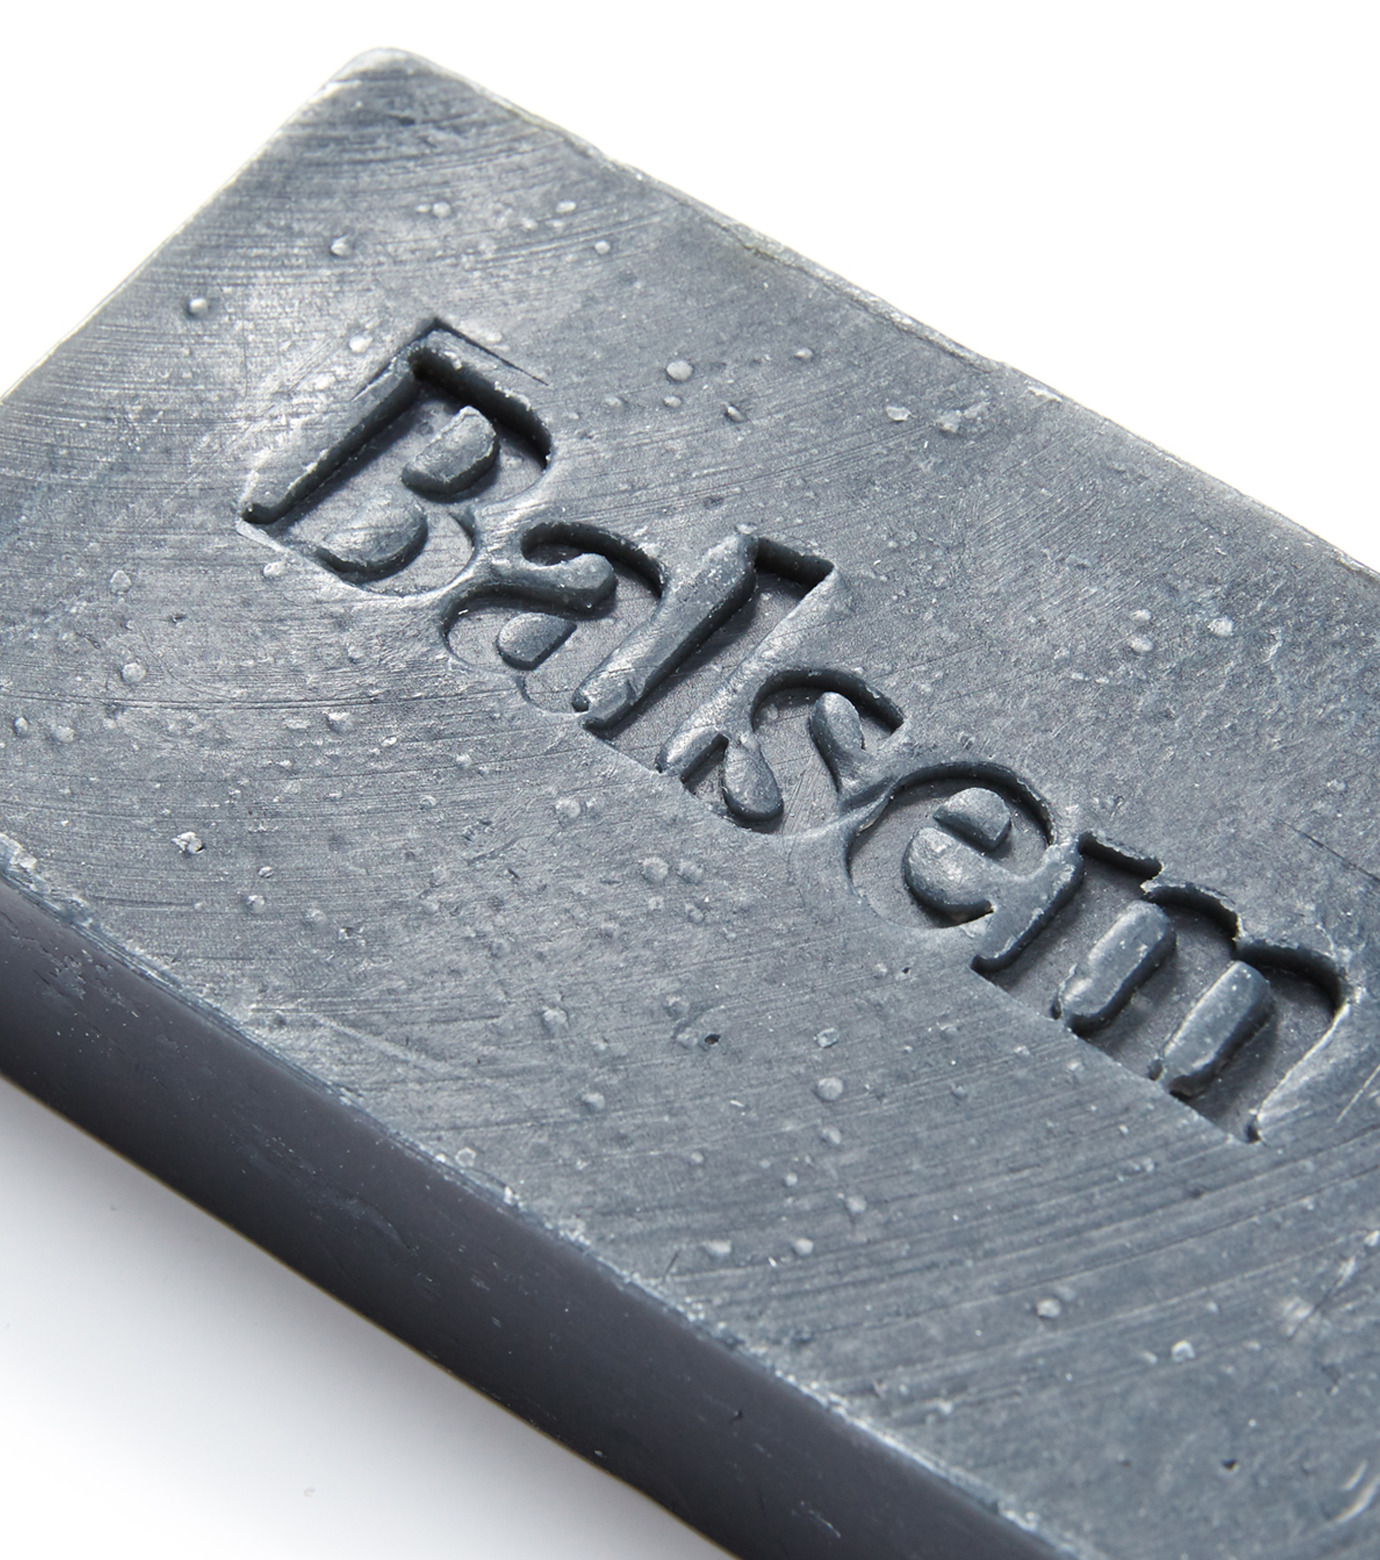 BALSEM()のBAR SOAP C/S 180g-WHITE(BATH-BODY-GROOMING/BATH-BODY-GROOMING)-MS-31031B-4 拡大詳細画像2